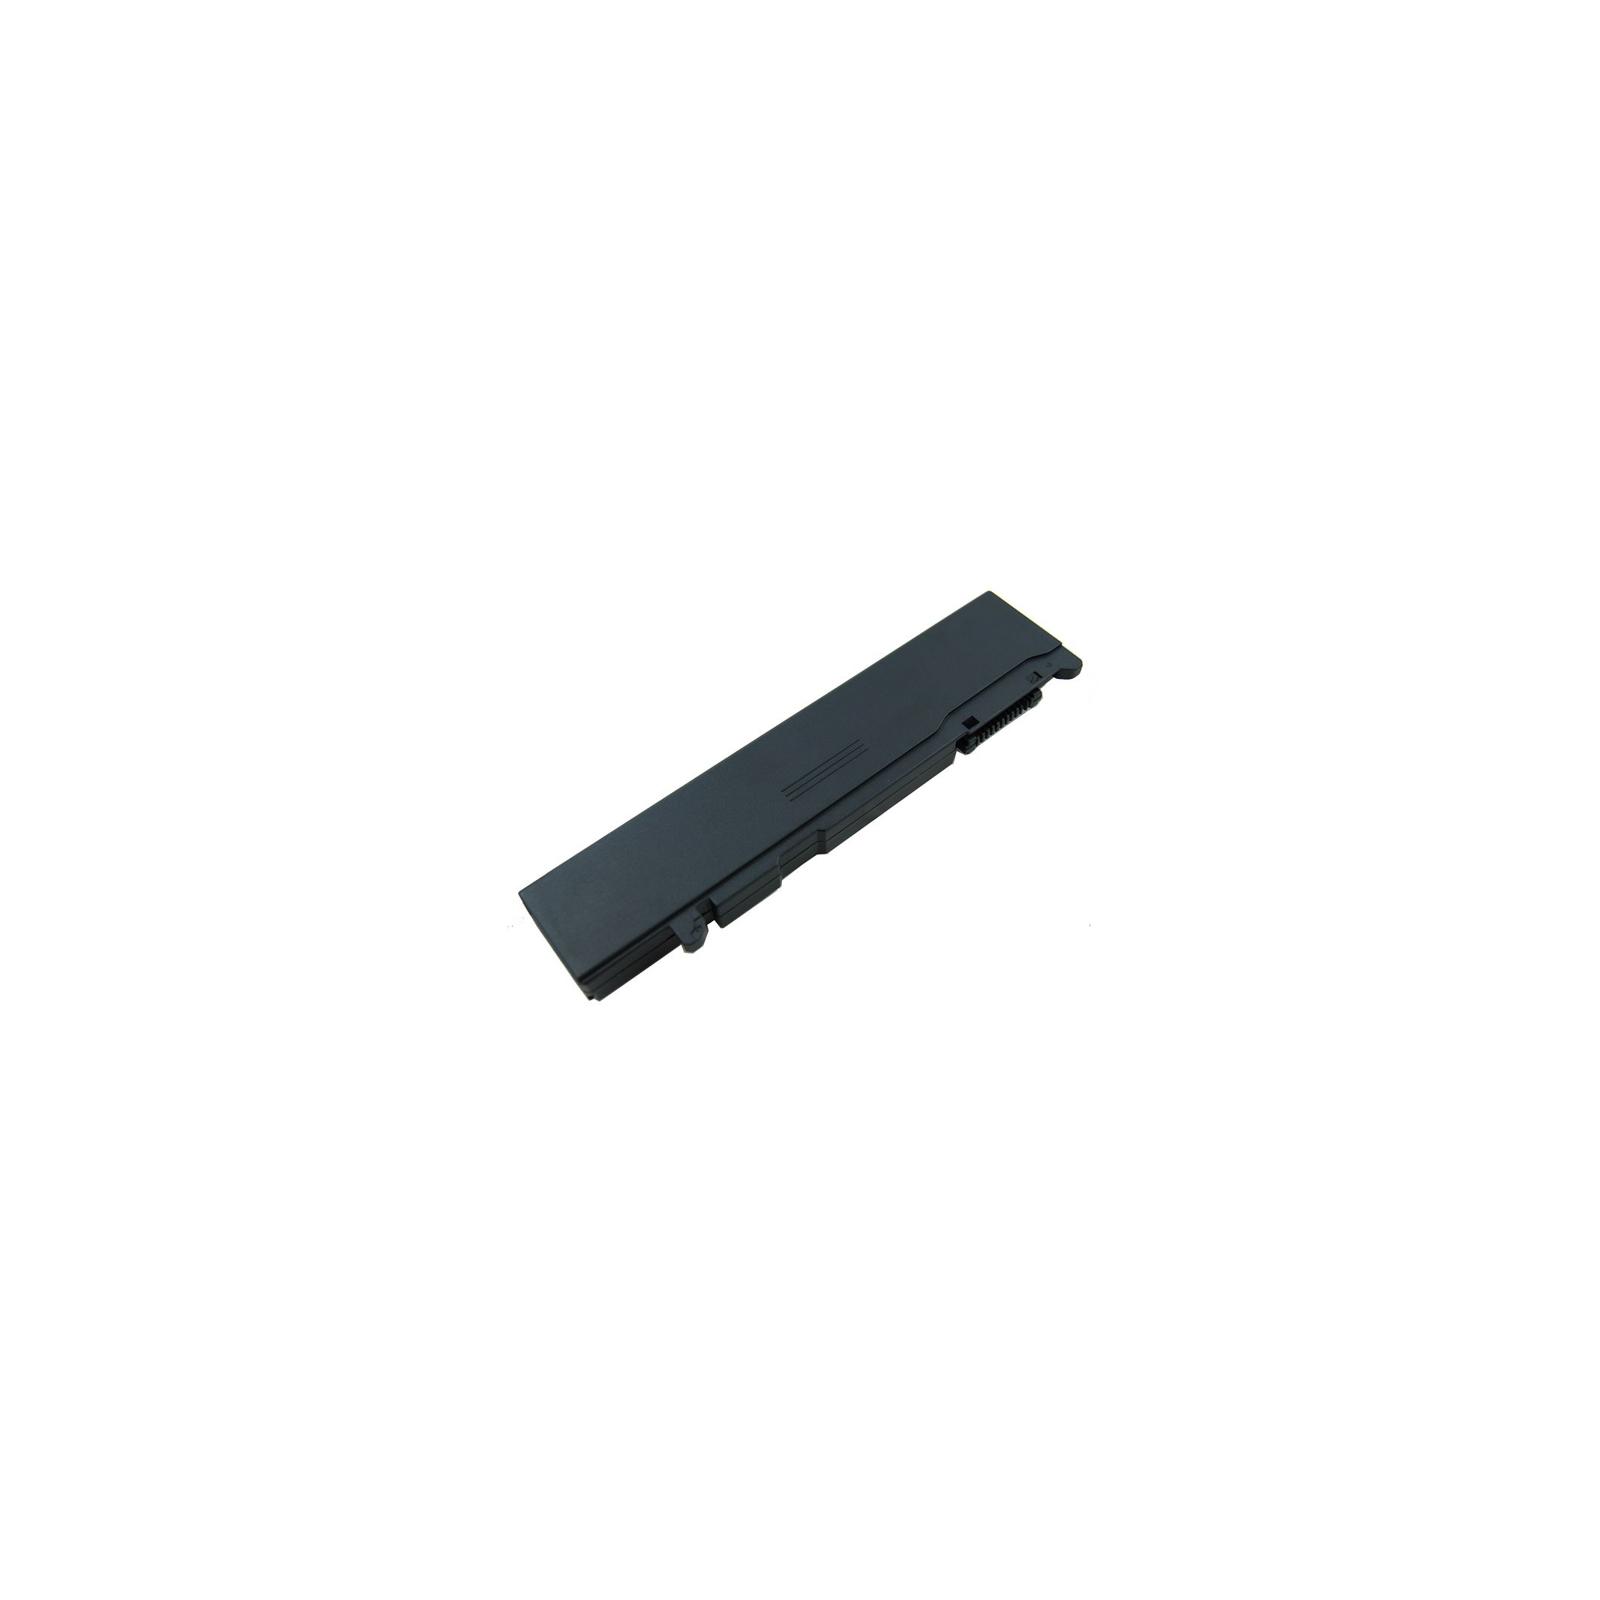 Аккумулятор для ноутбука TOSHIBA Satellite A50 (PA3356U,TA4356LH) 10.8V 5200mAh PowerPlant (NB00000141)